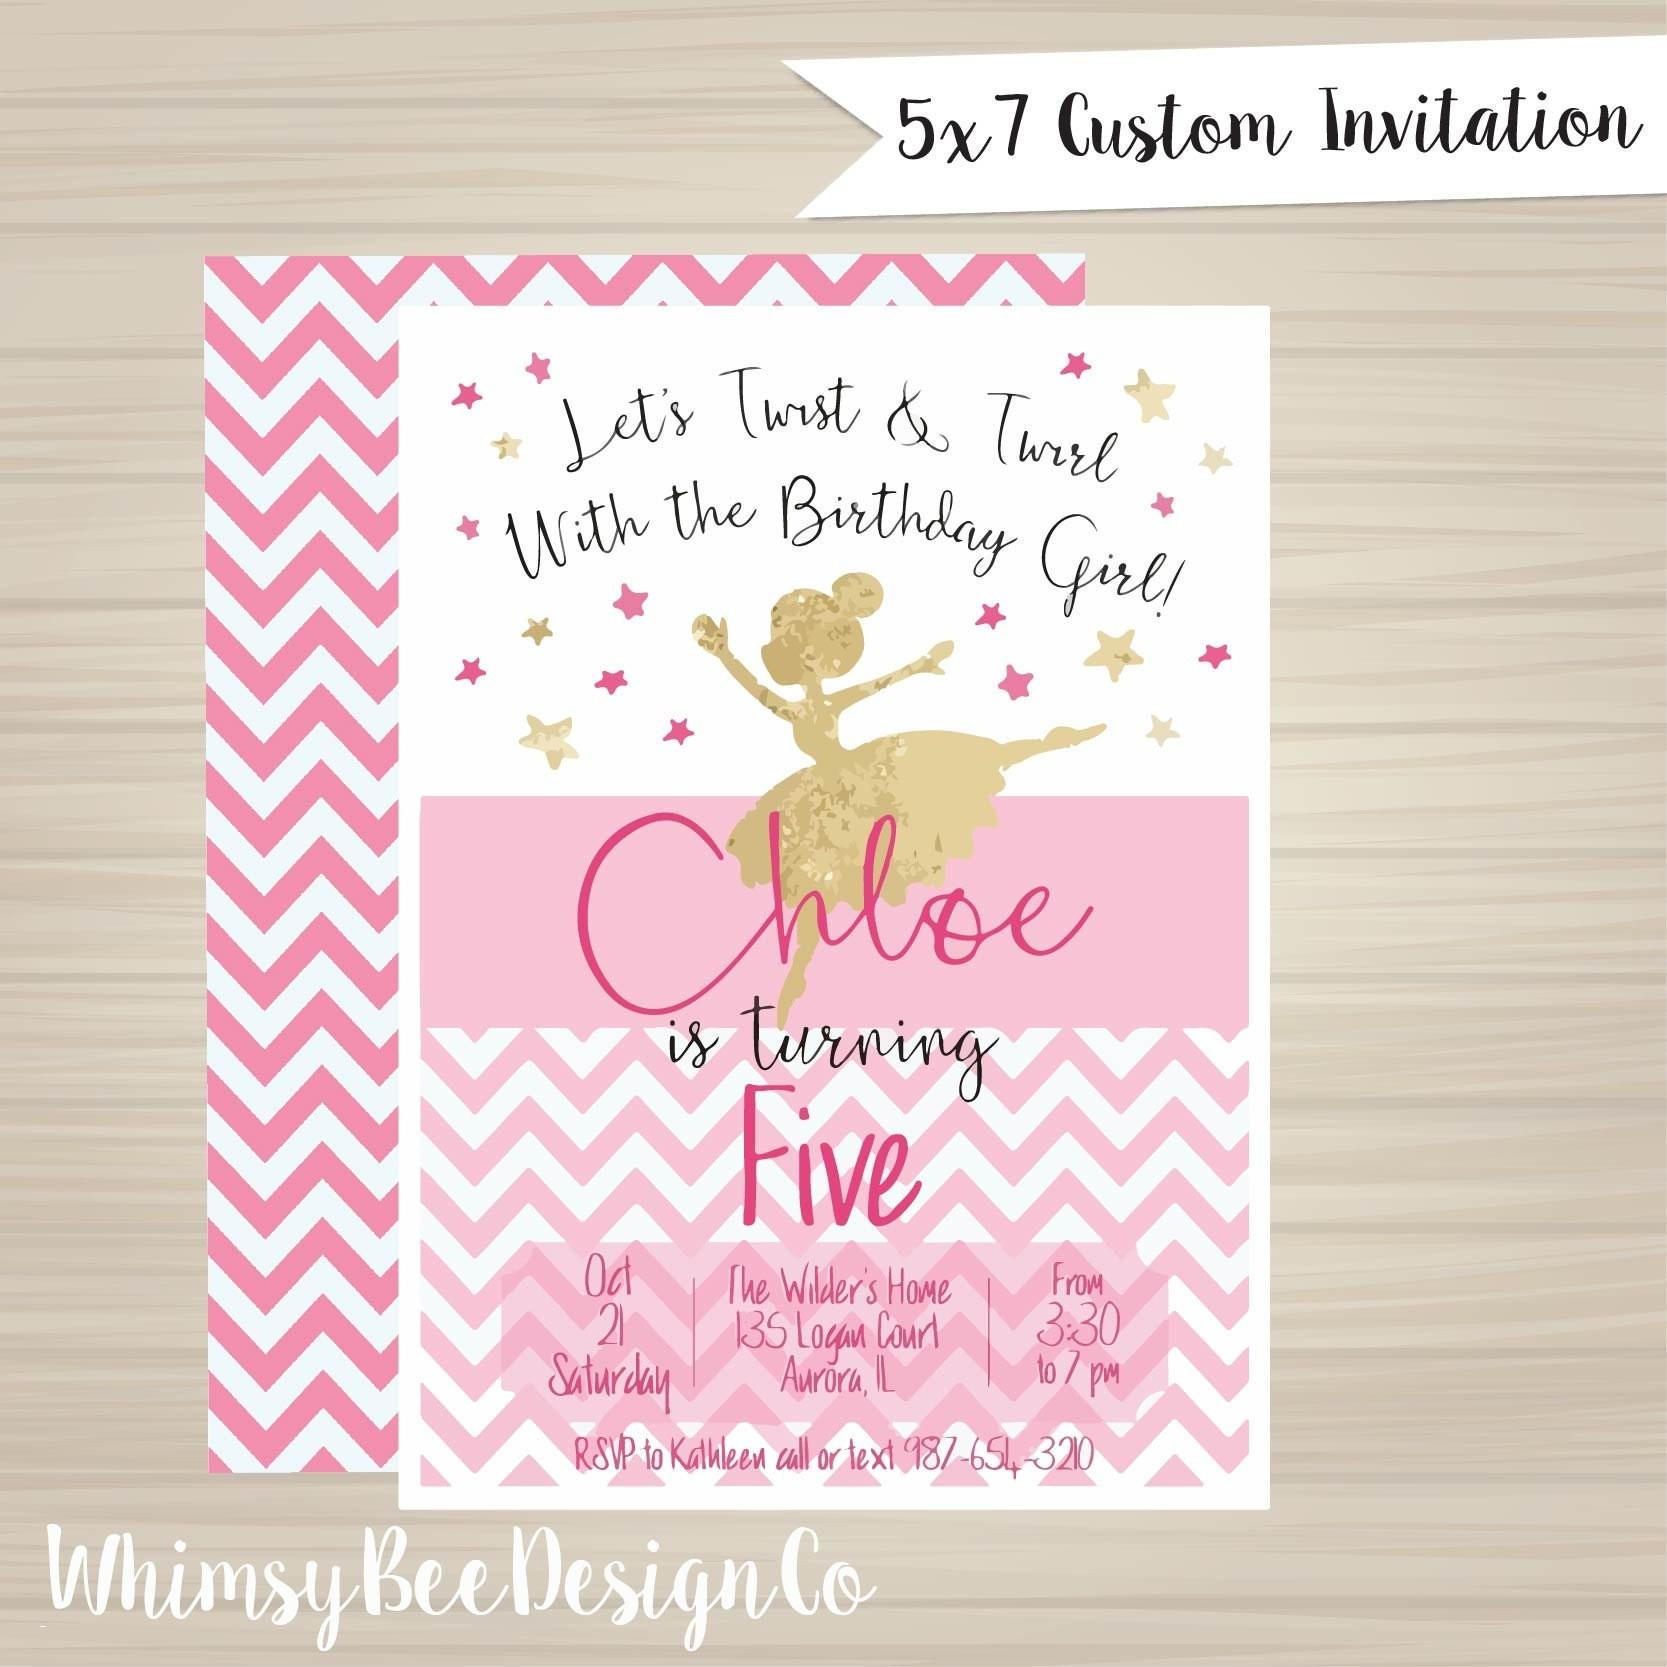 Surprise Birthday Invitations Fresh Free Printable Surprise Birthday - Free Printable Polka Dot Birthday Party Invitations